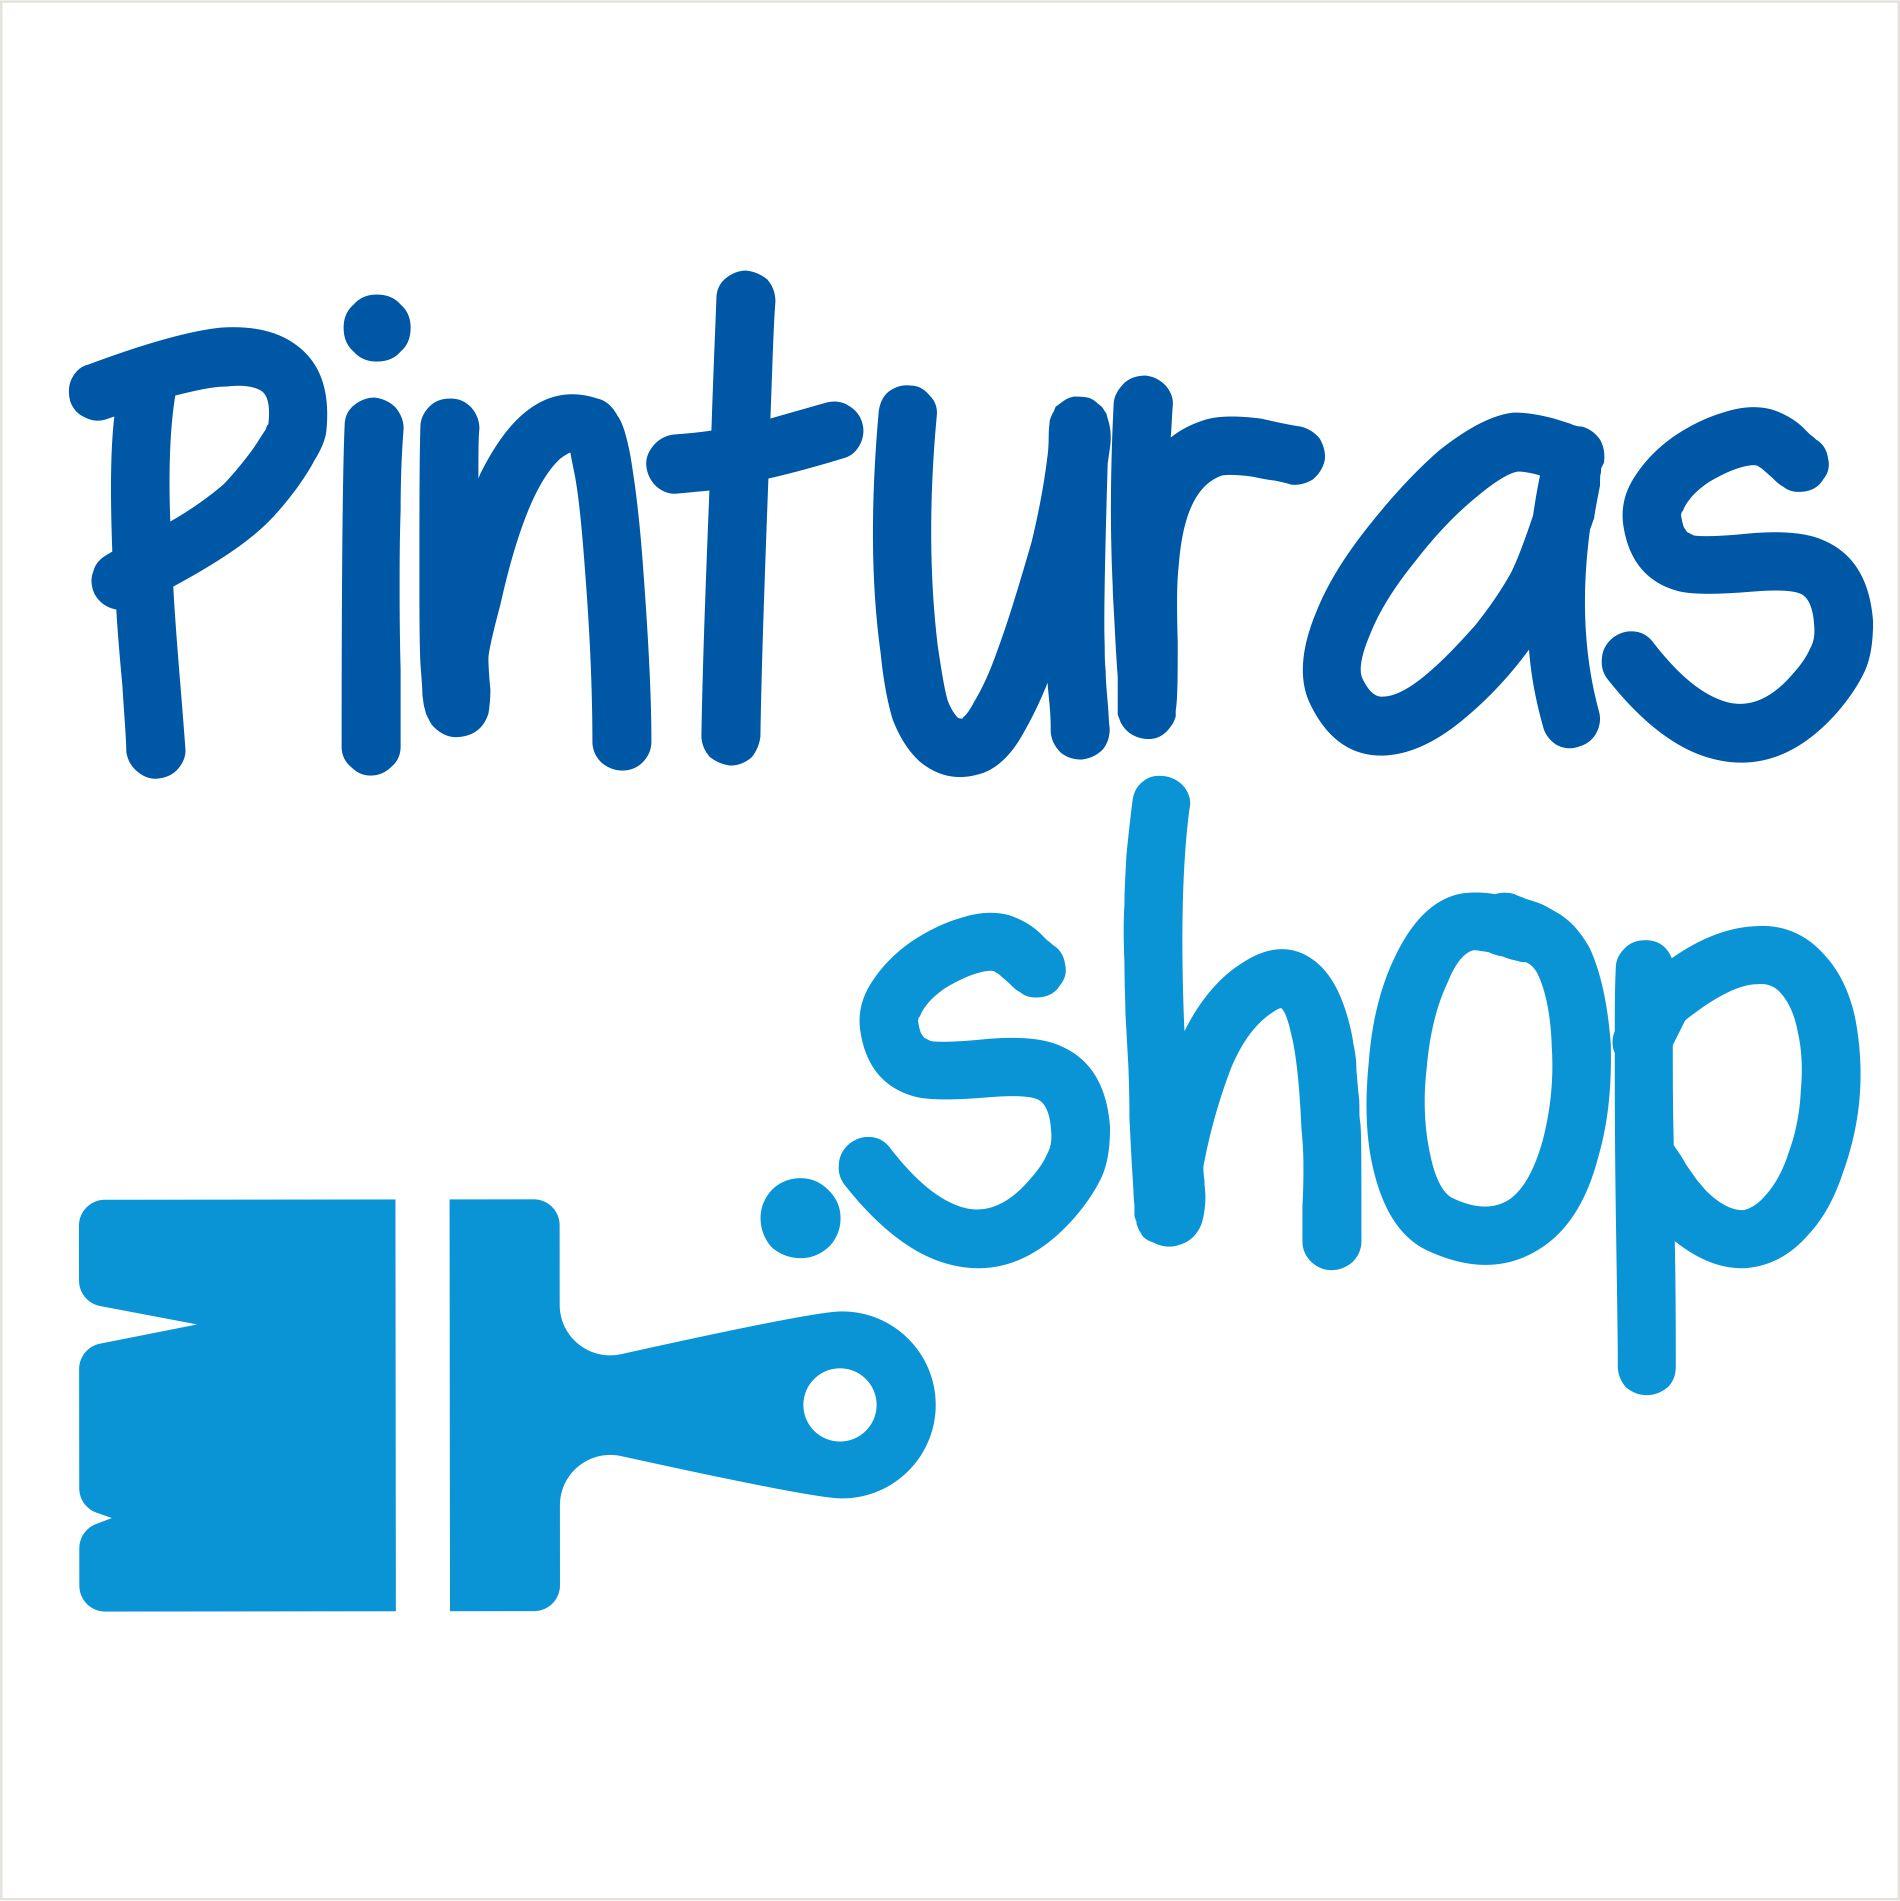 Pinturas.shop